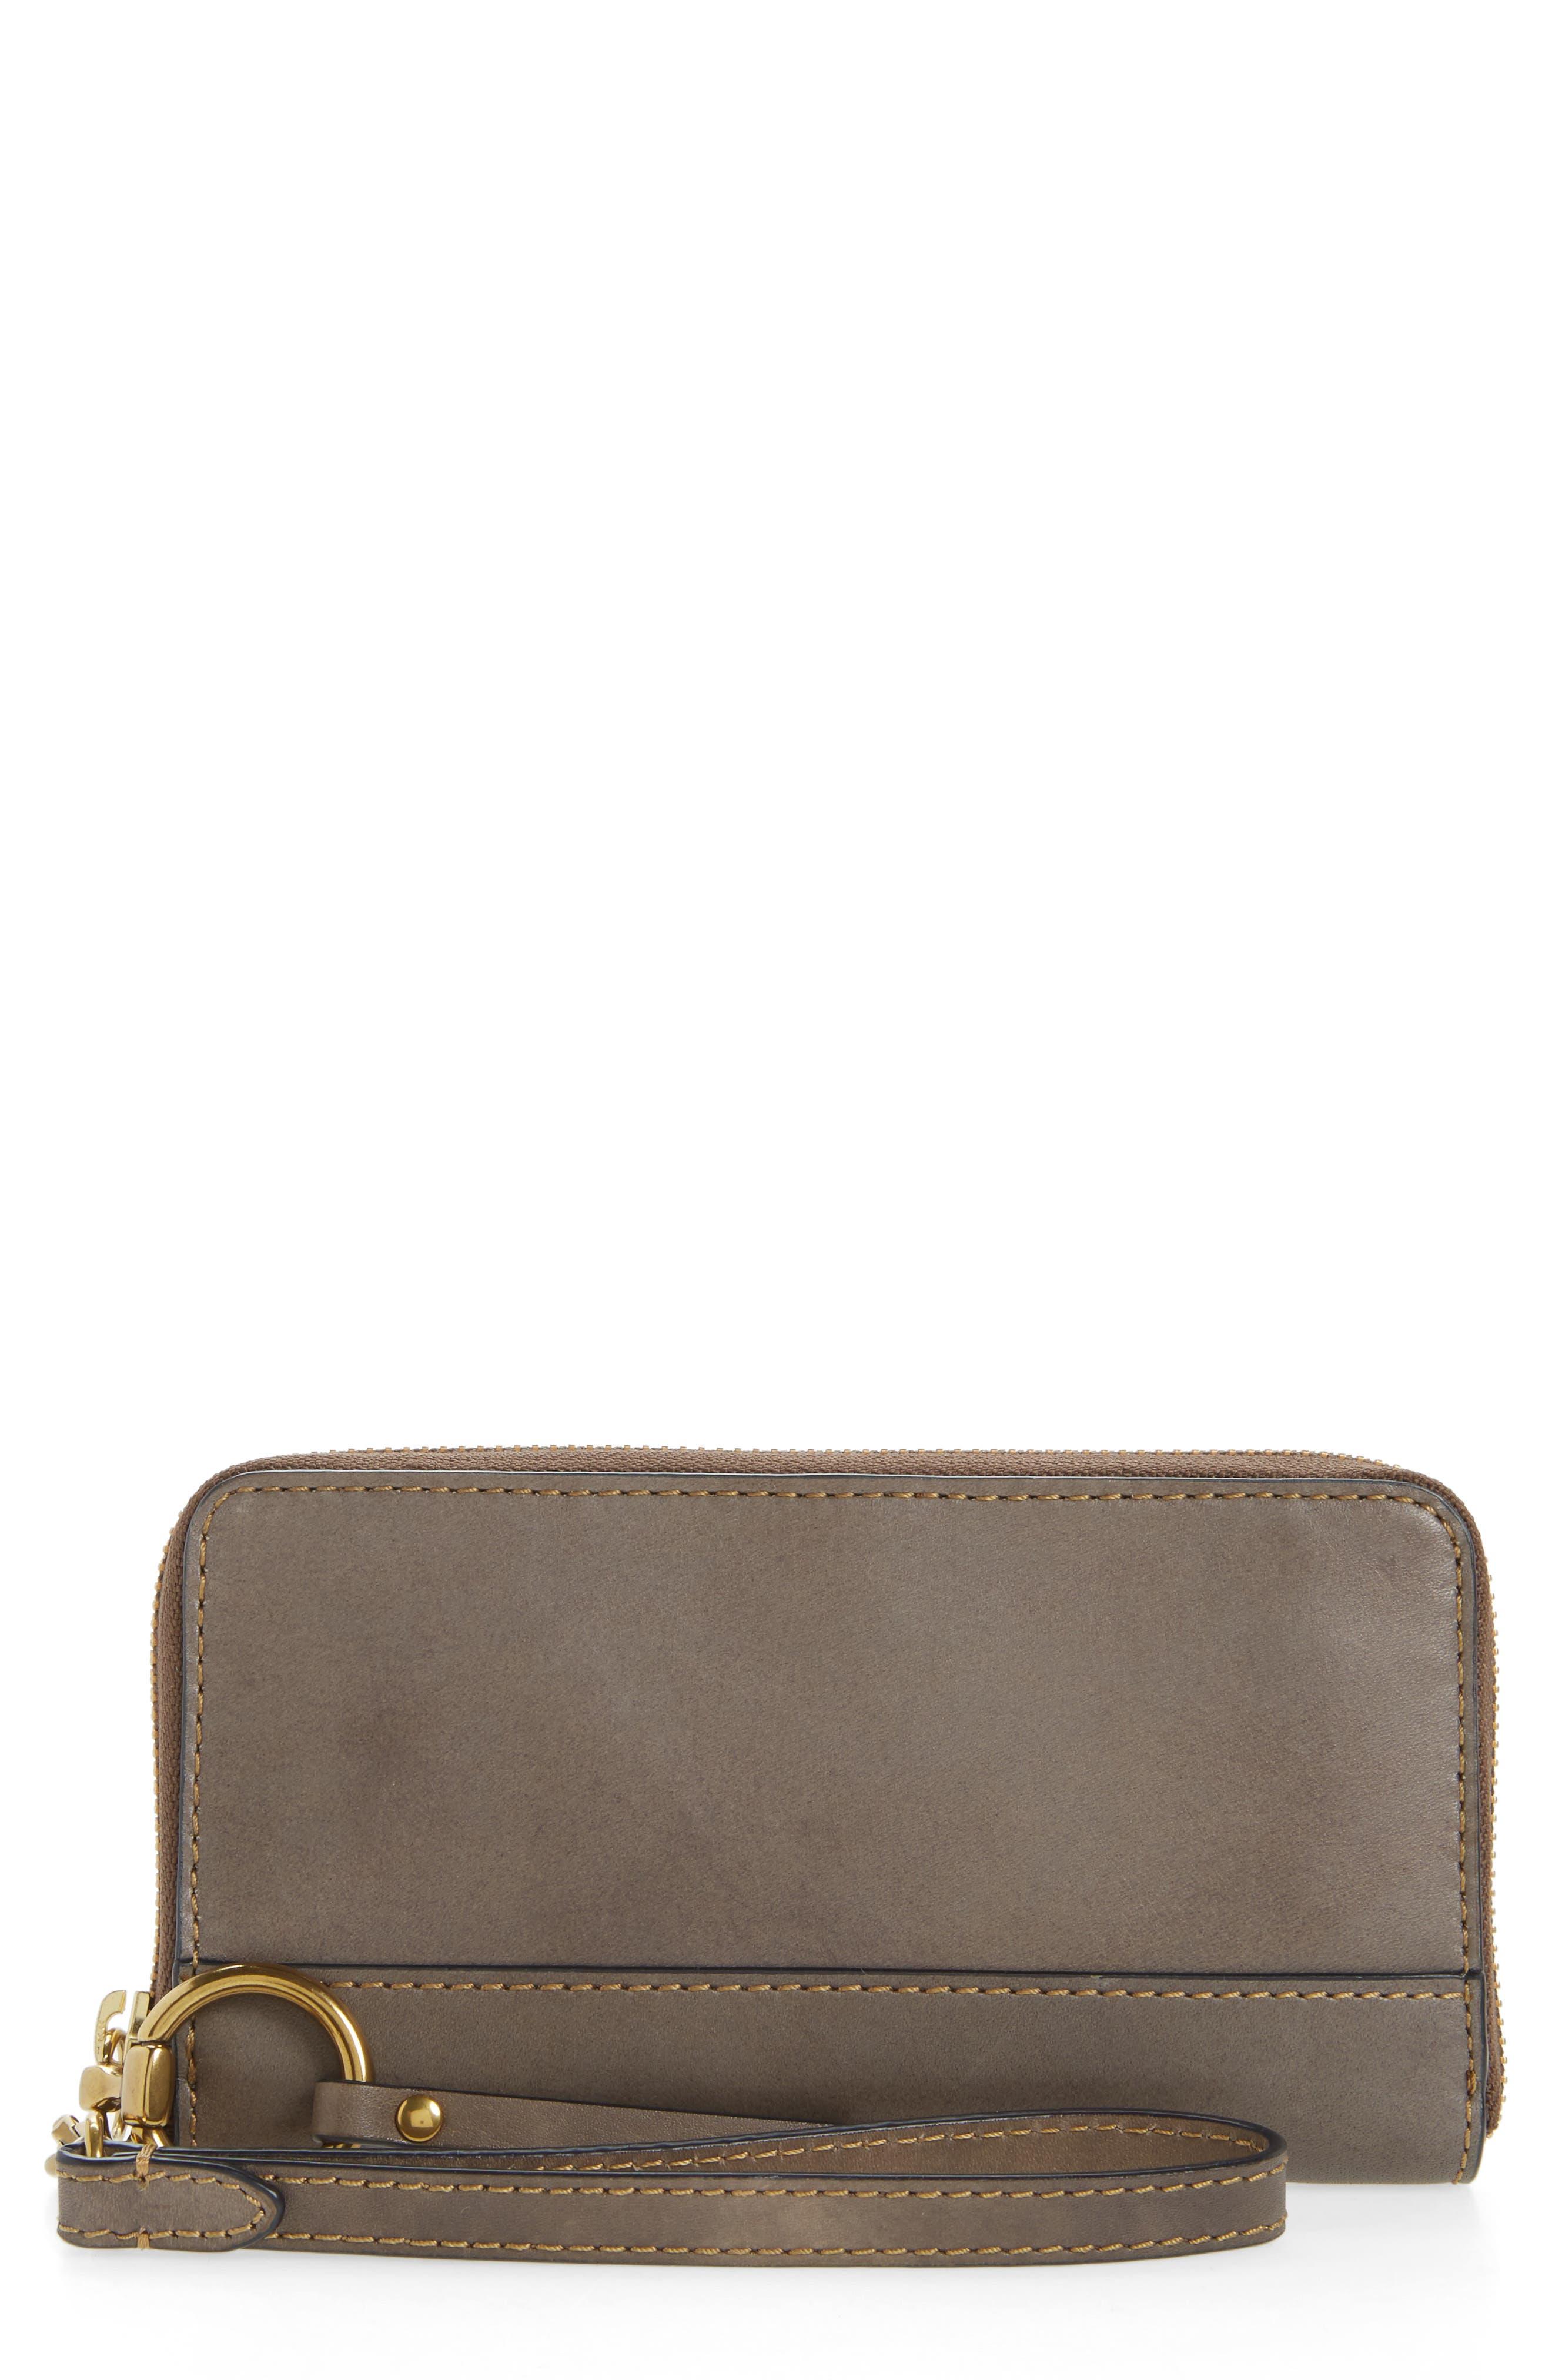 Alternate Image 1 Selected - Frye Ilana Harness Phone Leather Zip Wallet